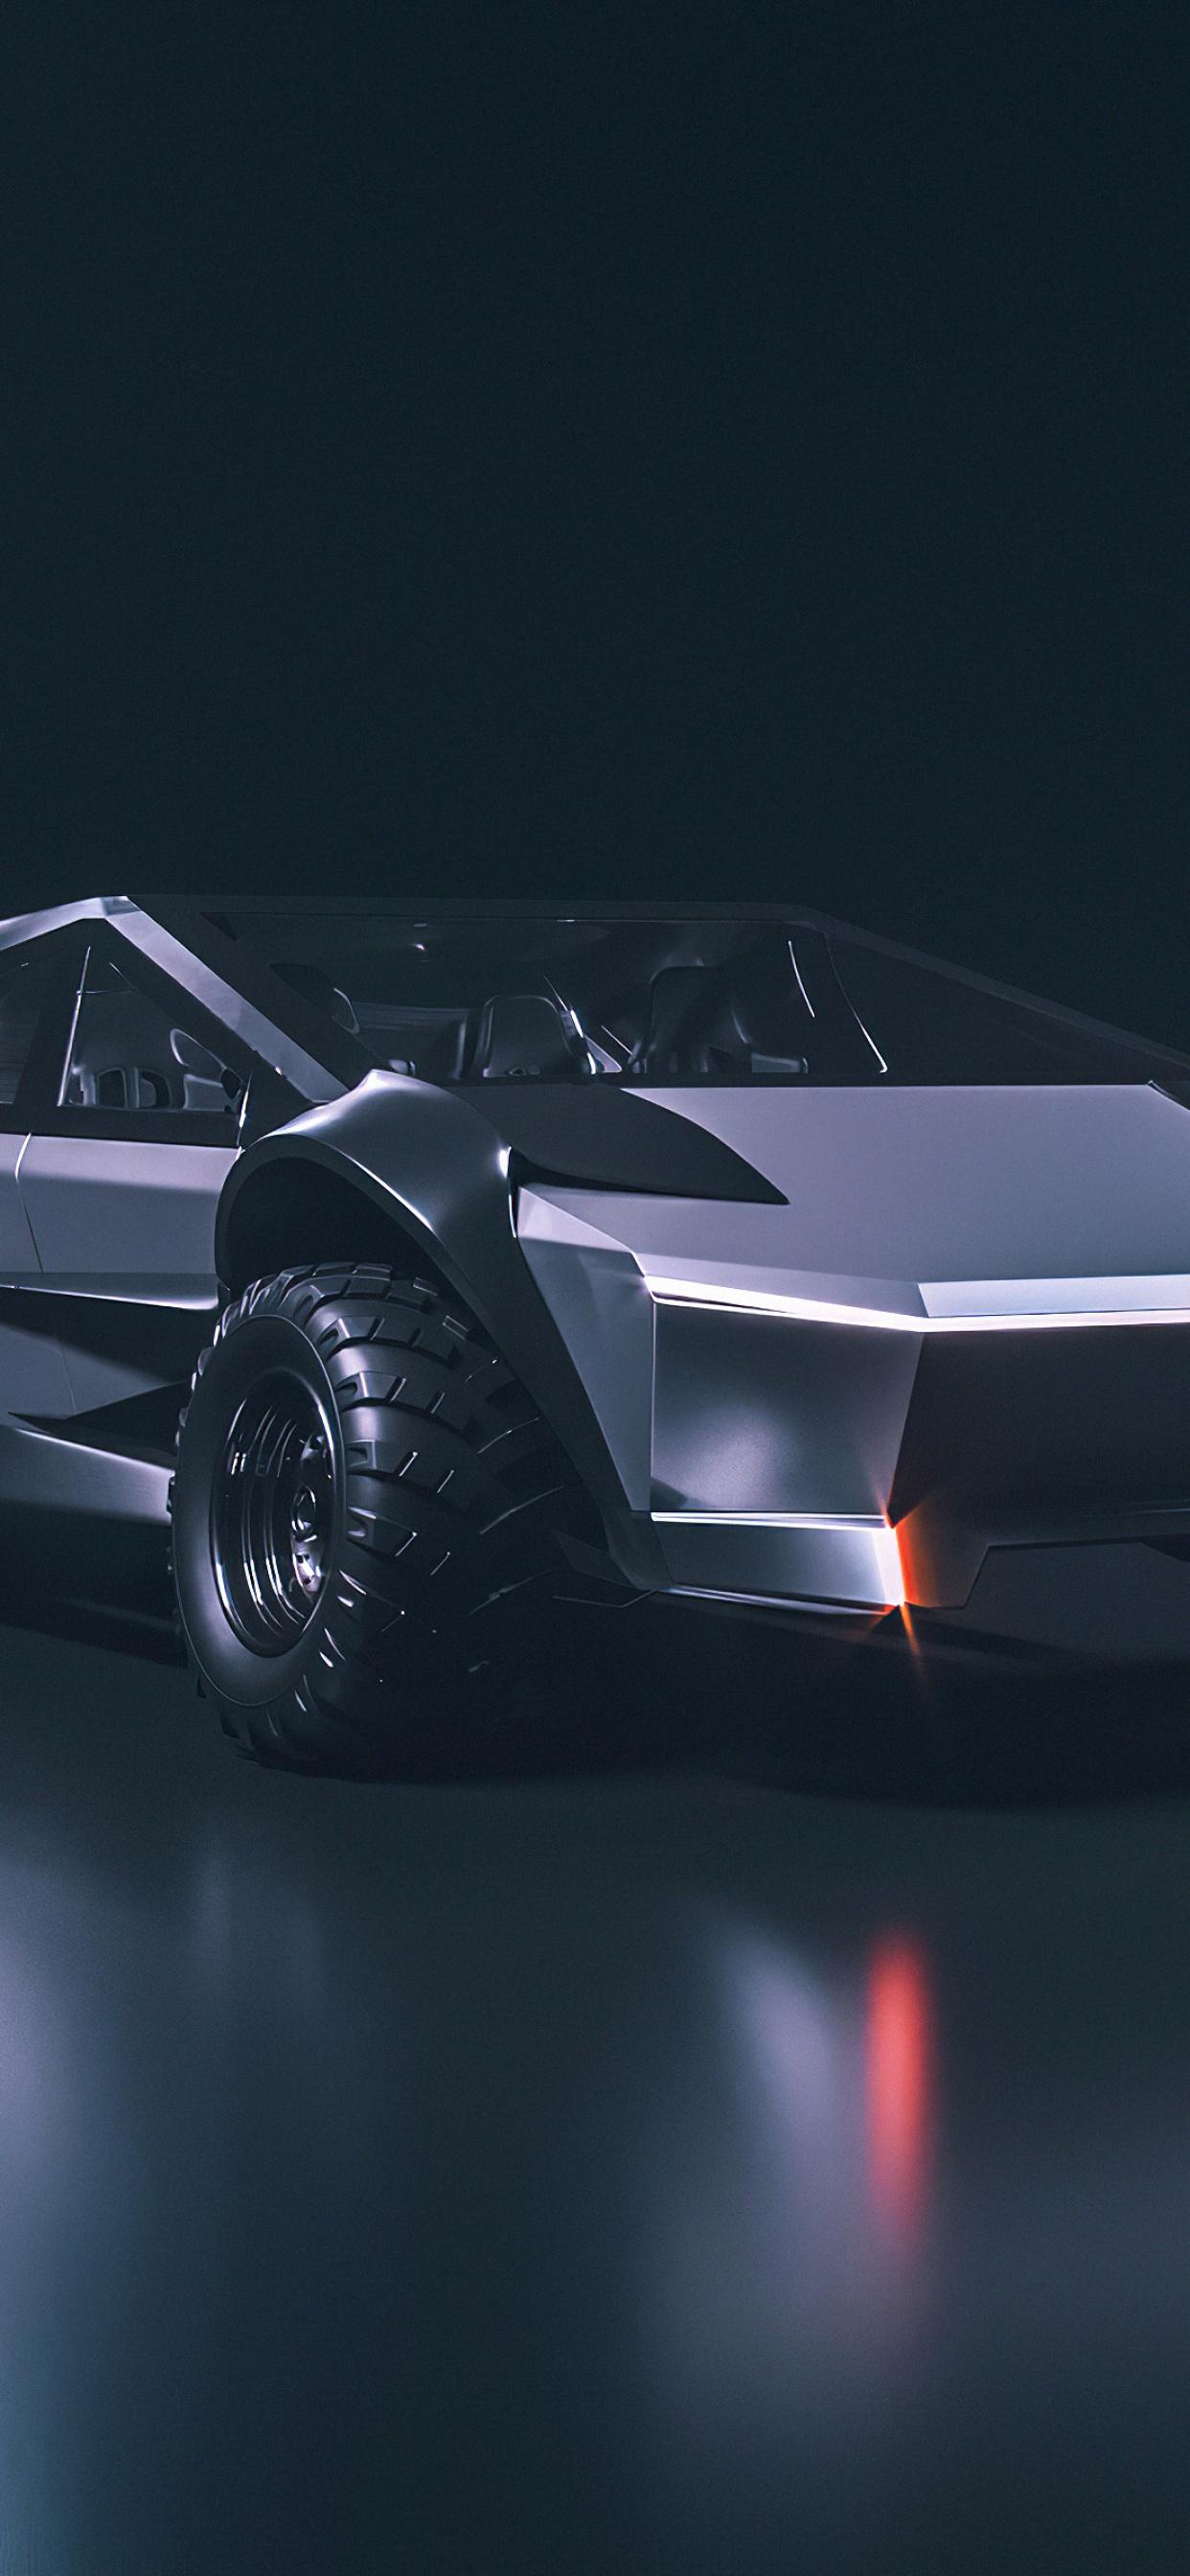 Tesla Cybertruck 4k Wallpaper Concept Cars Cars 882